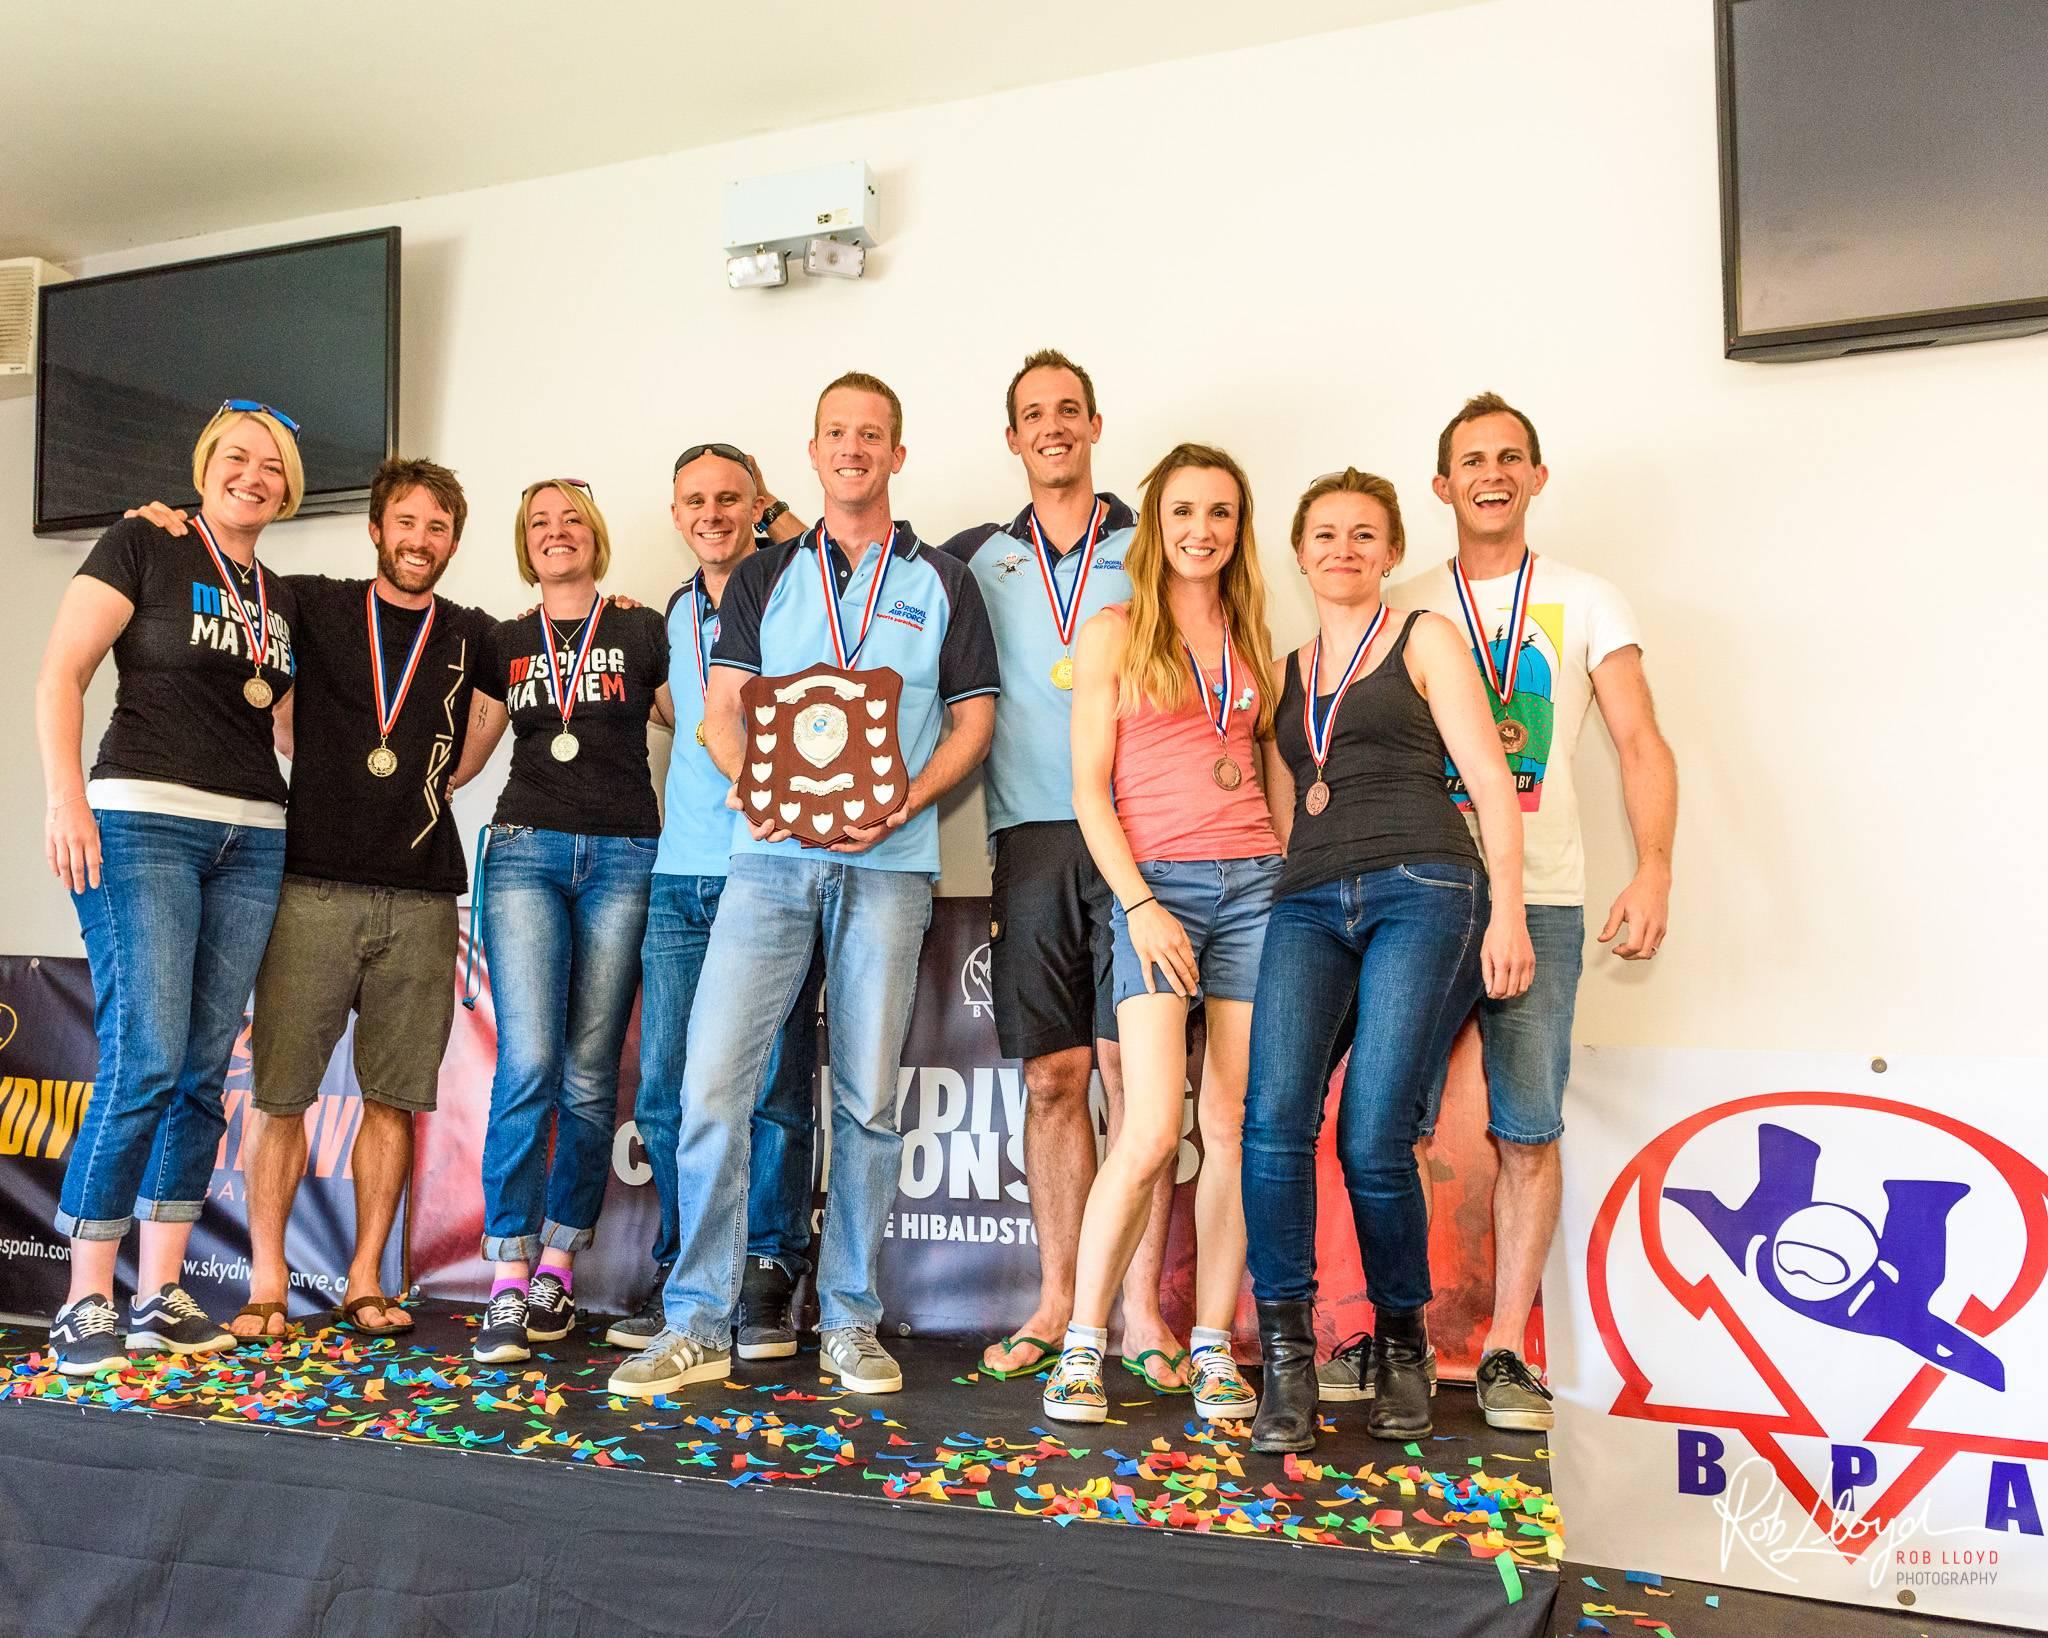 Freefly B  medallists